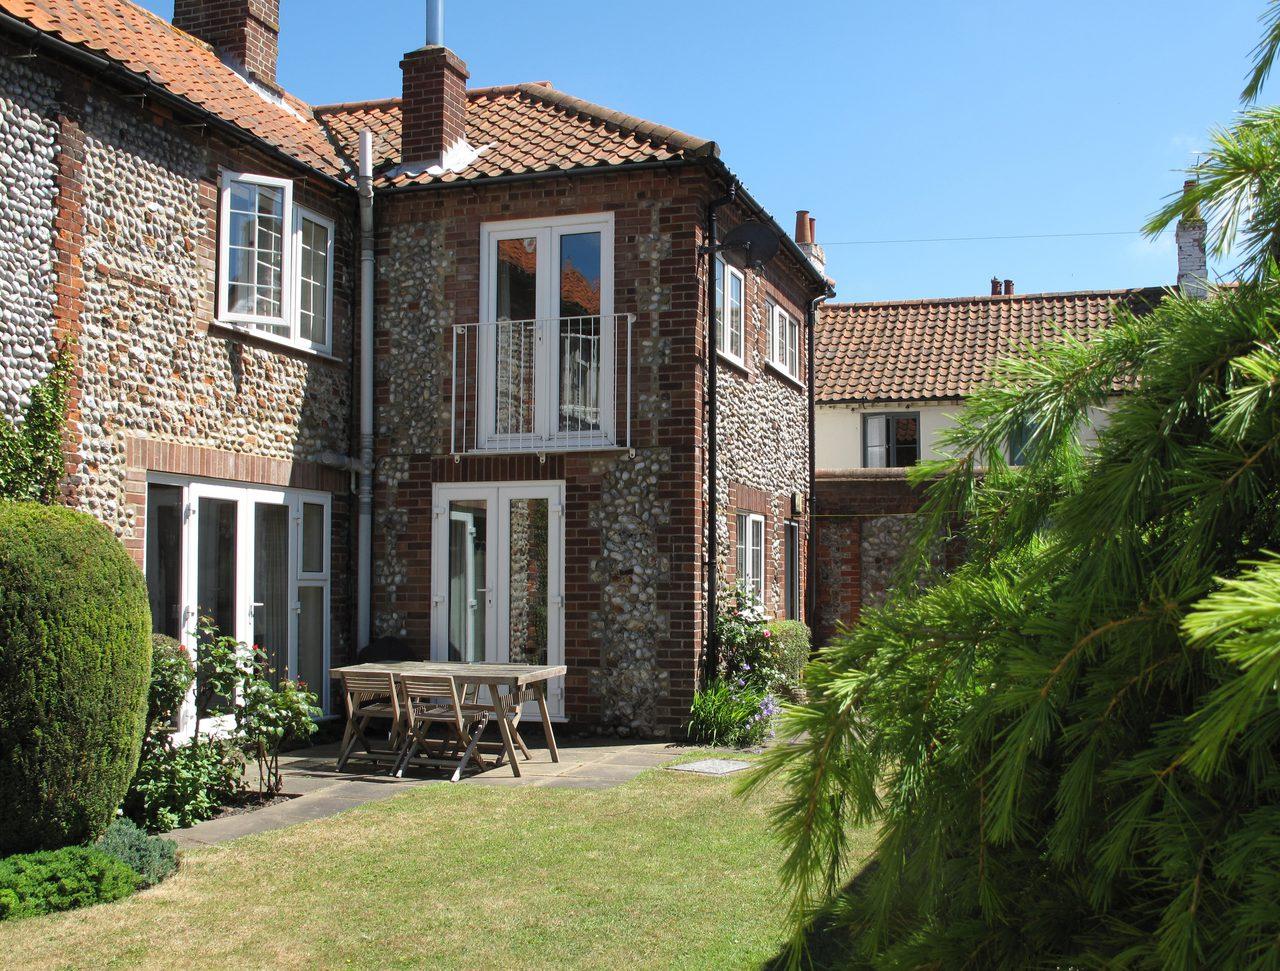 Zetland Cottage Exterior And Garden